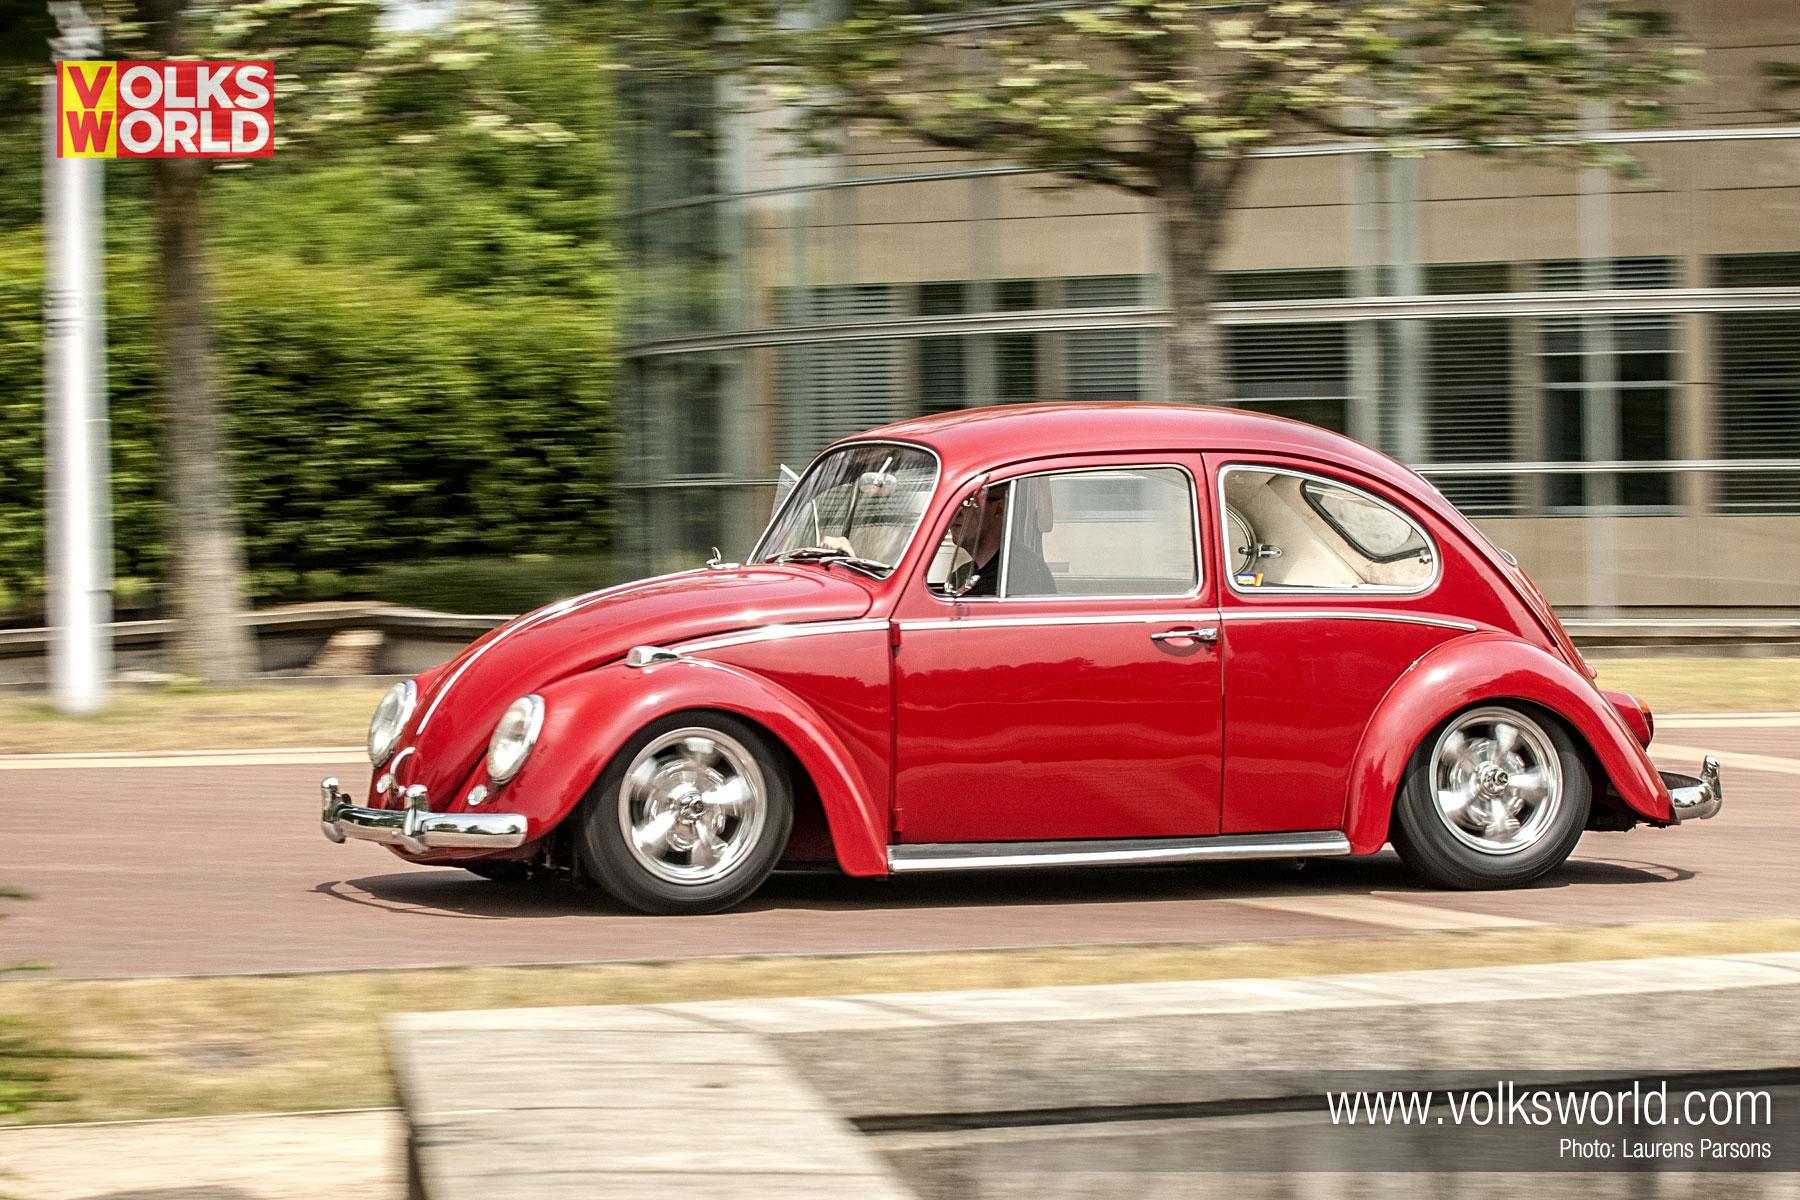 VW Wallpaper Sept 13 24 1800x1200